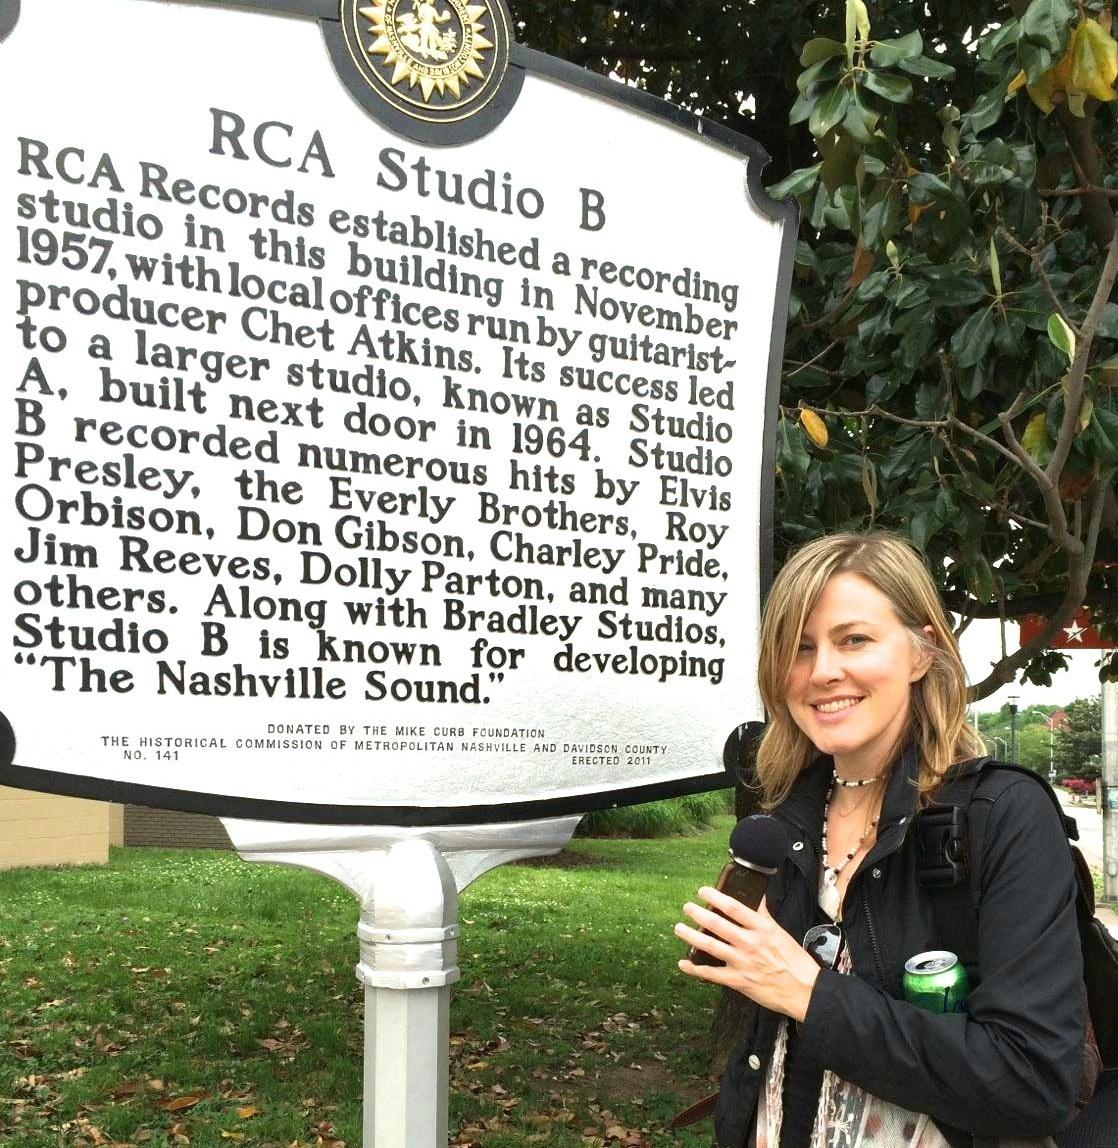 Songlines Podcast John Hiatt RCA 210529